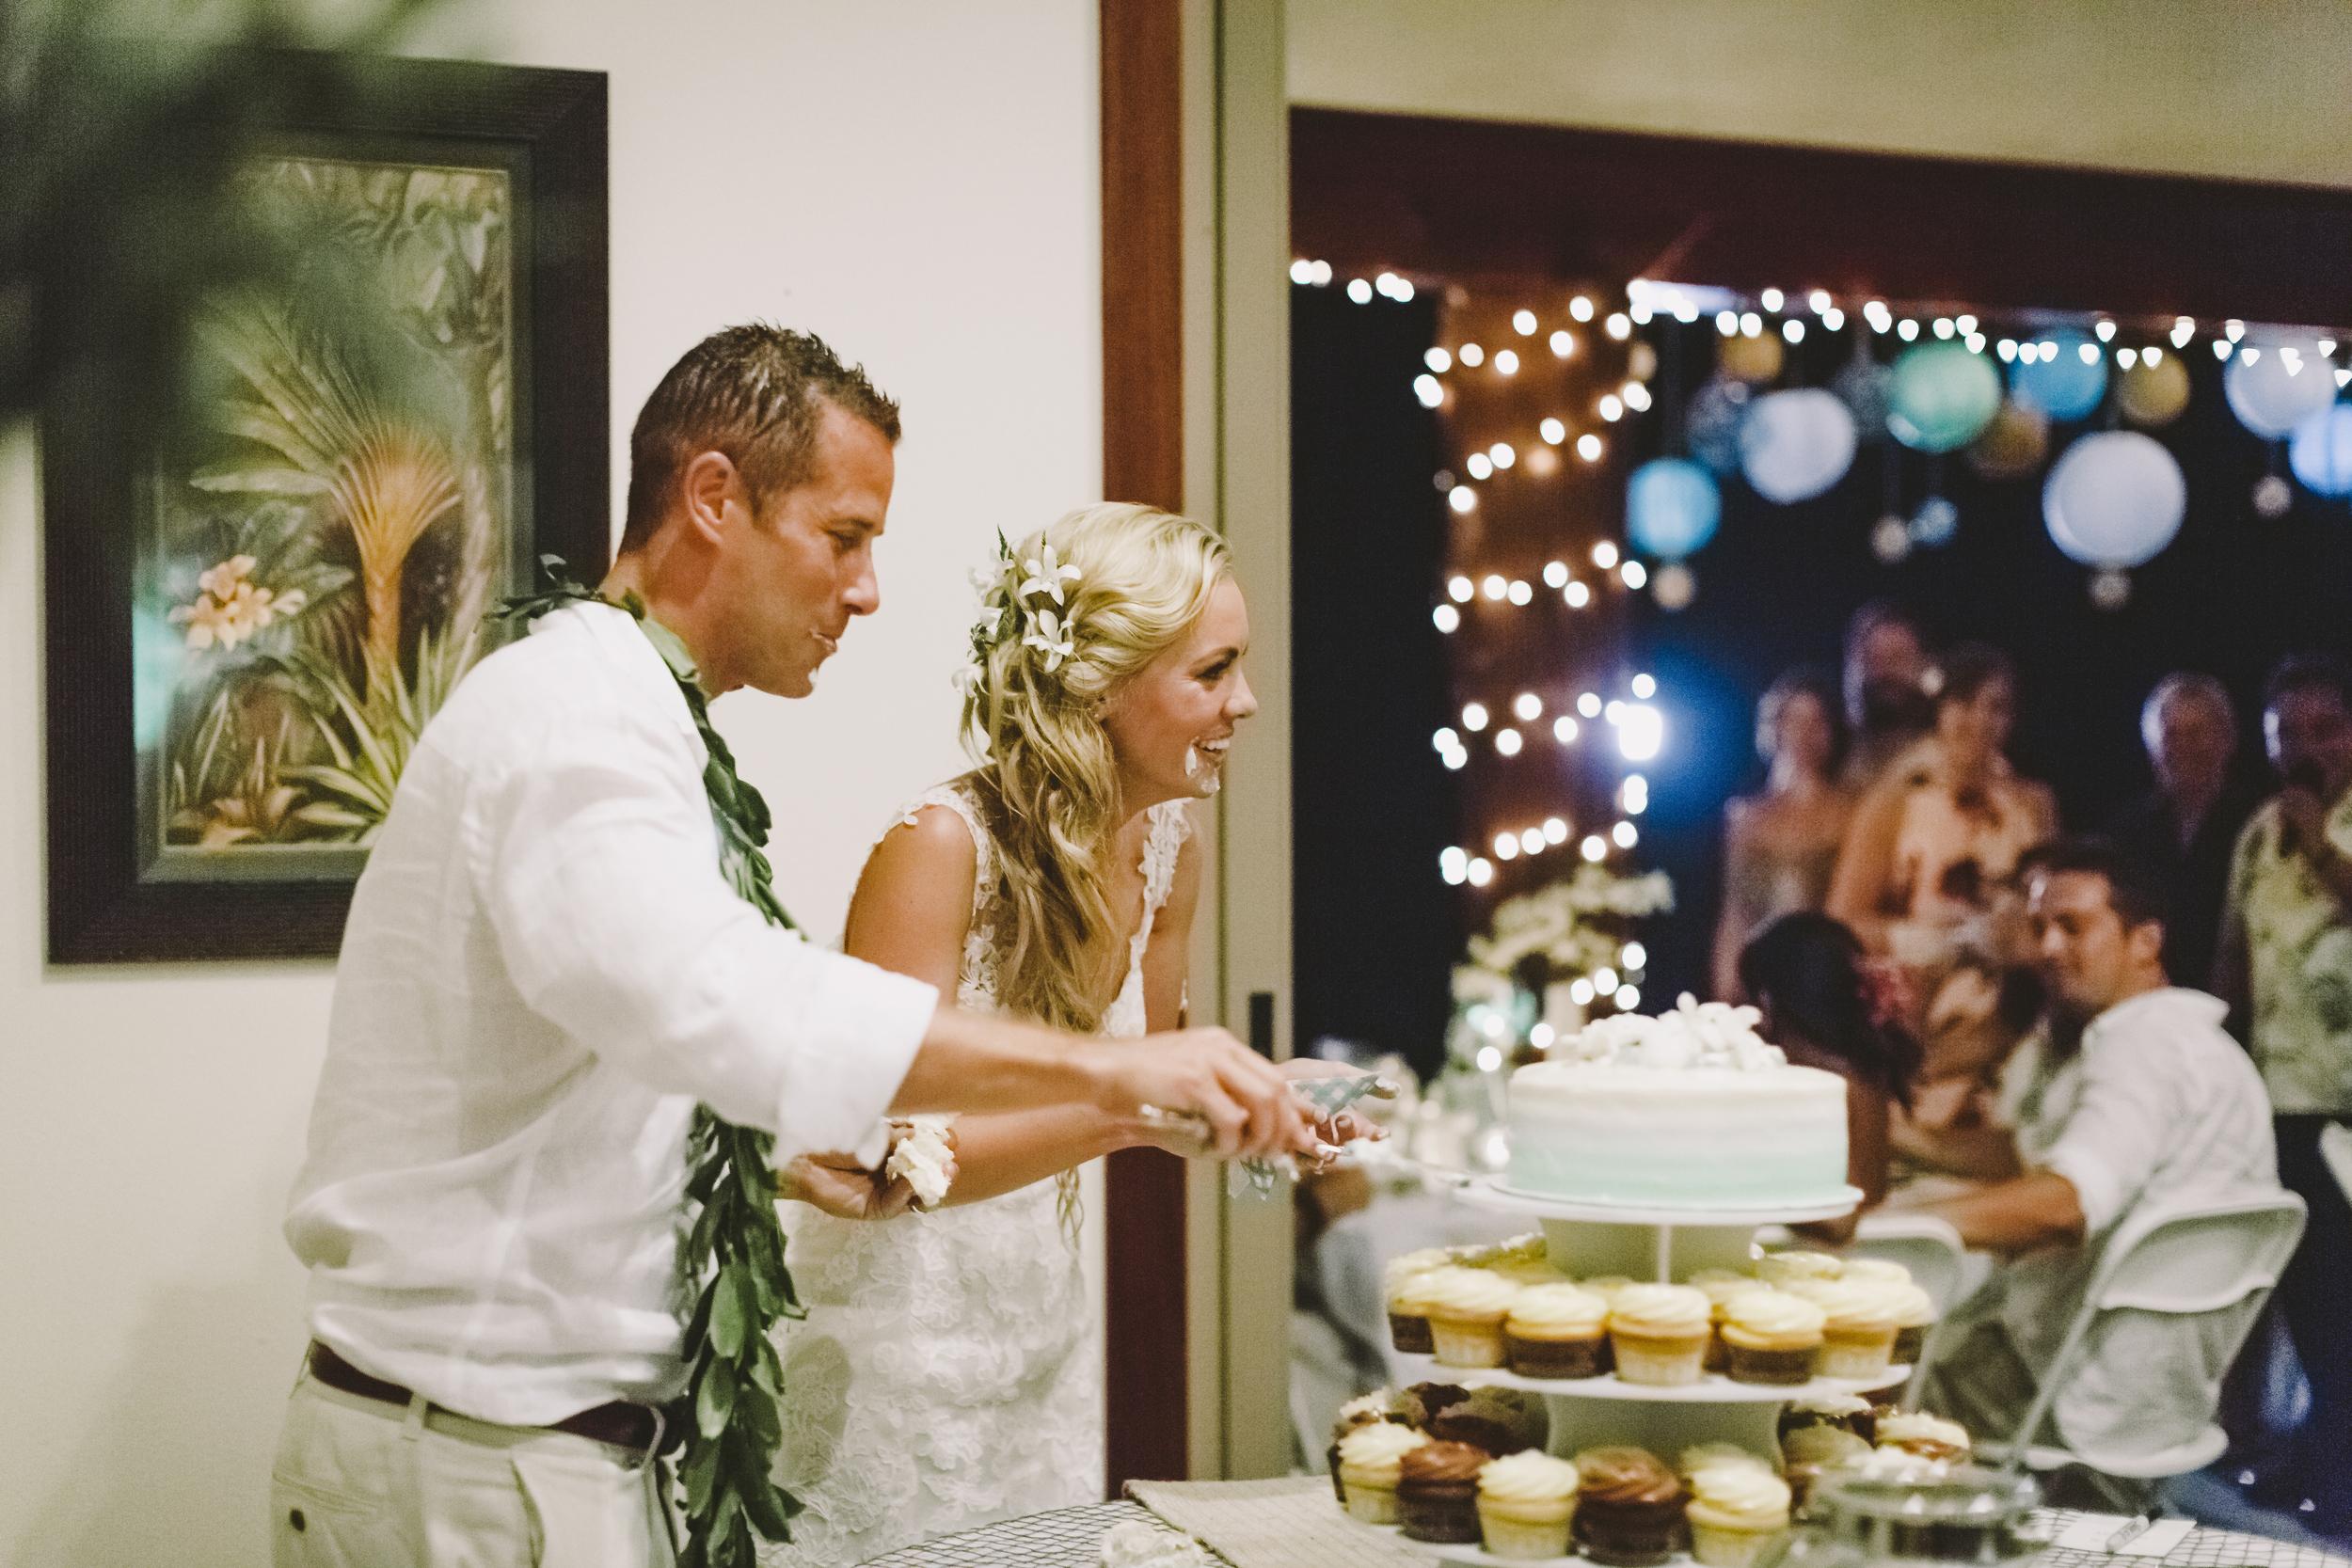 angie-diaz-photography-hawaii-wedding-photographer-kelli-jay-132.jpg